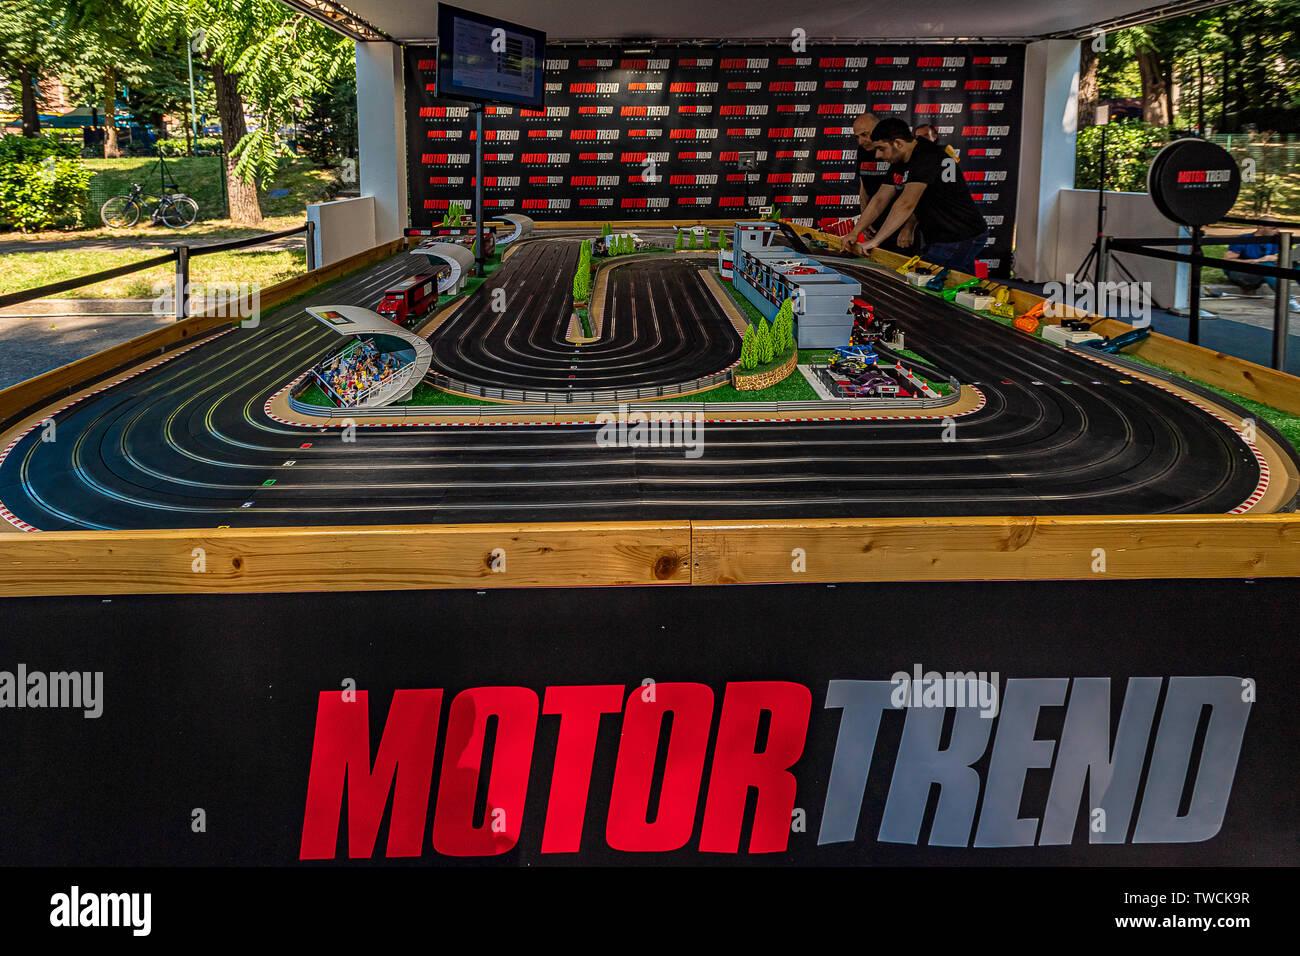 Piedmont Turin - Turin auto show 2019  - Valentino park -  Motor Trand Stock Photo